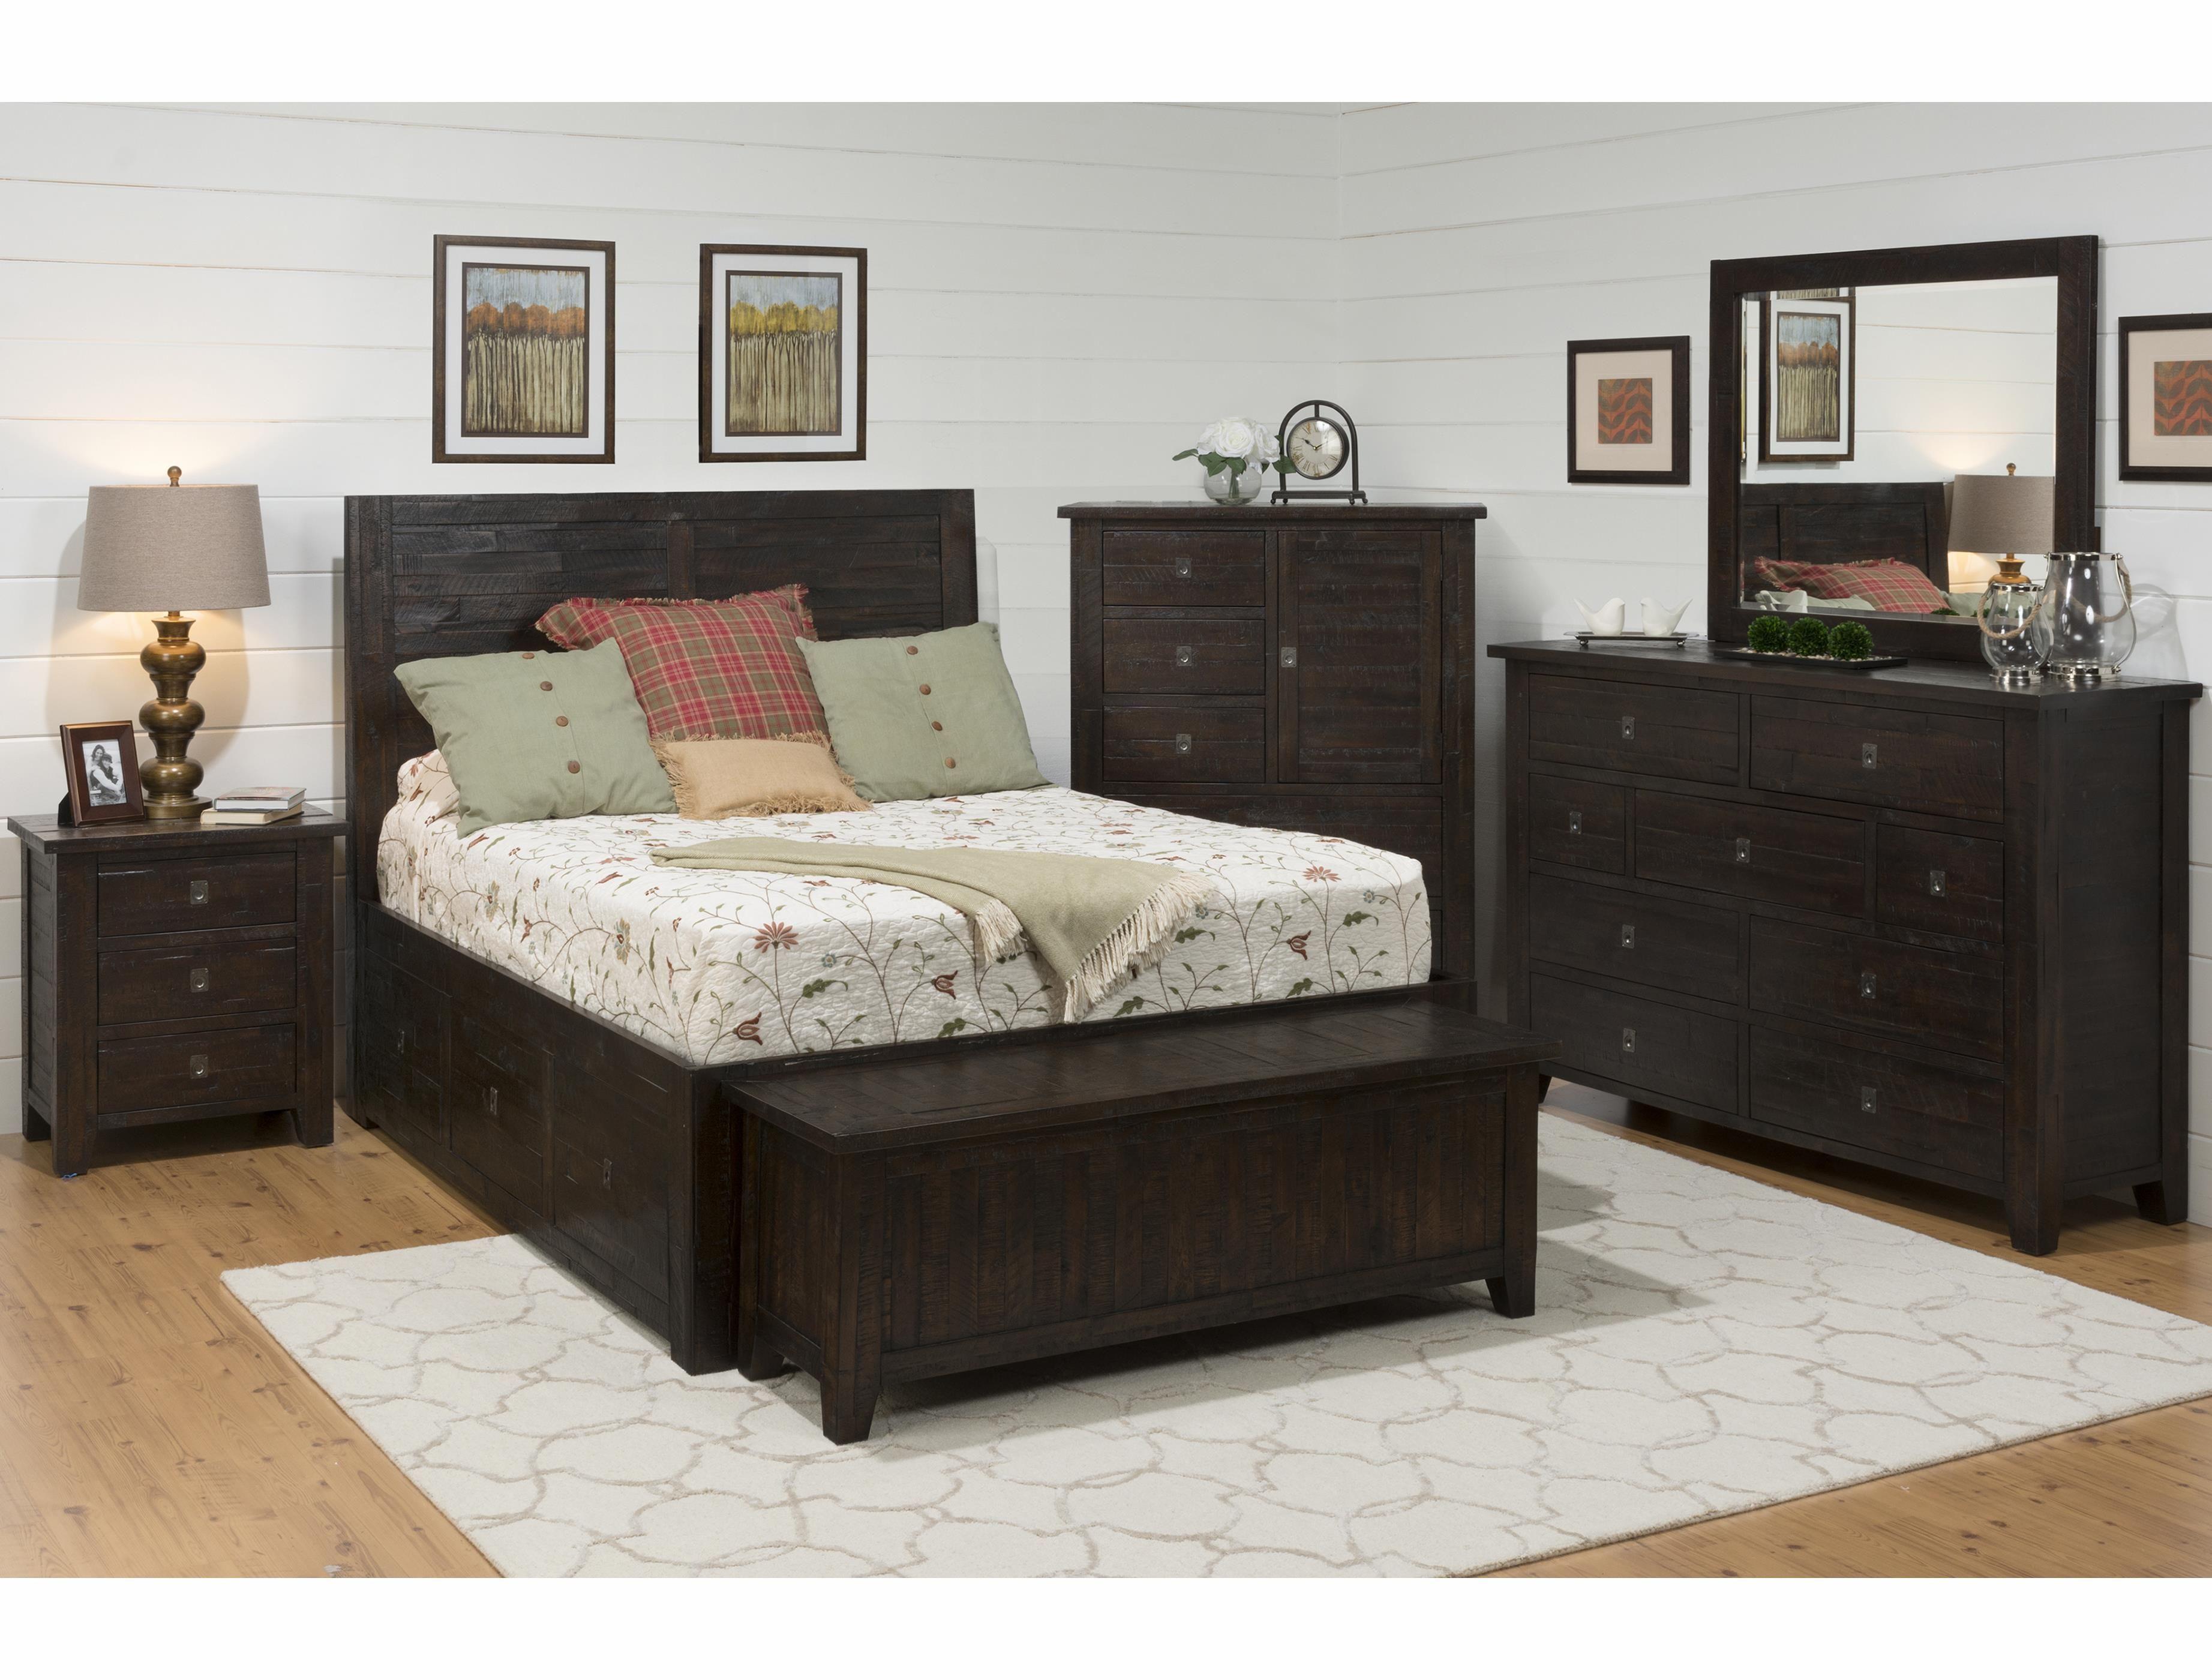 Kona Grove Queen Bedroom Group by Jofran at Story & Lee